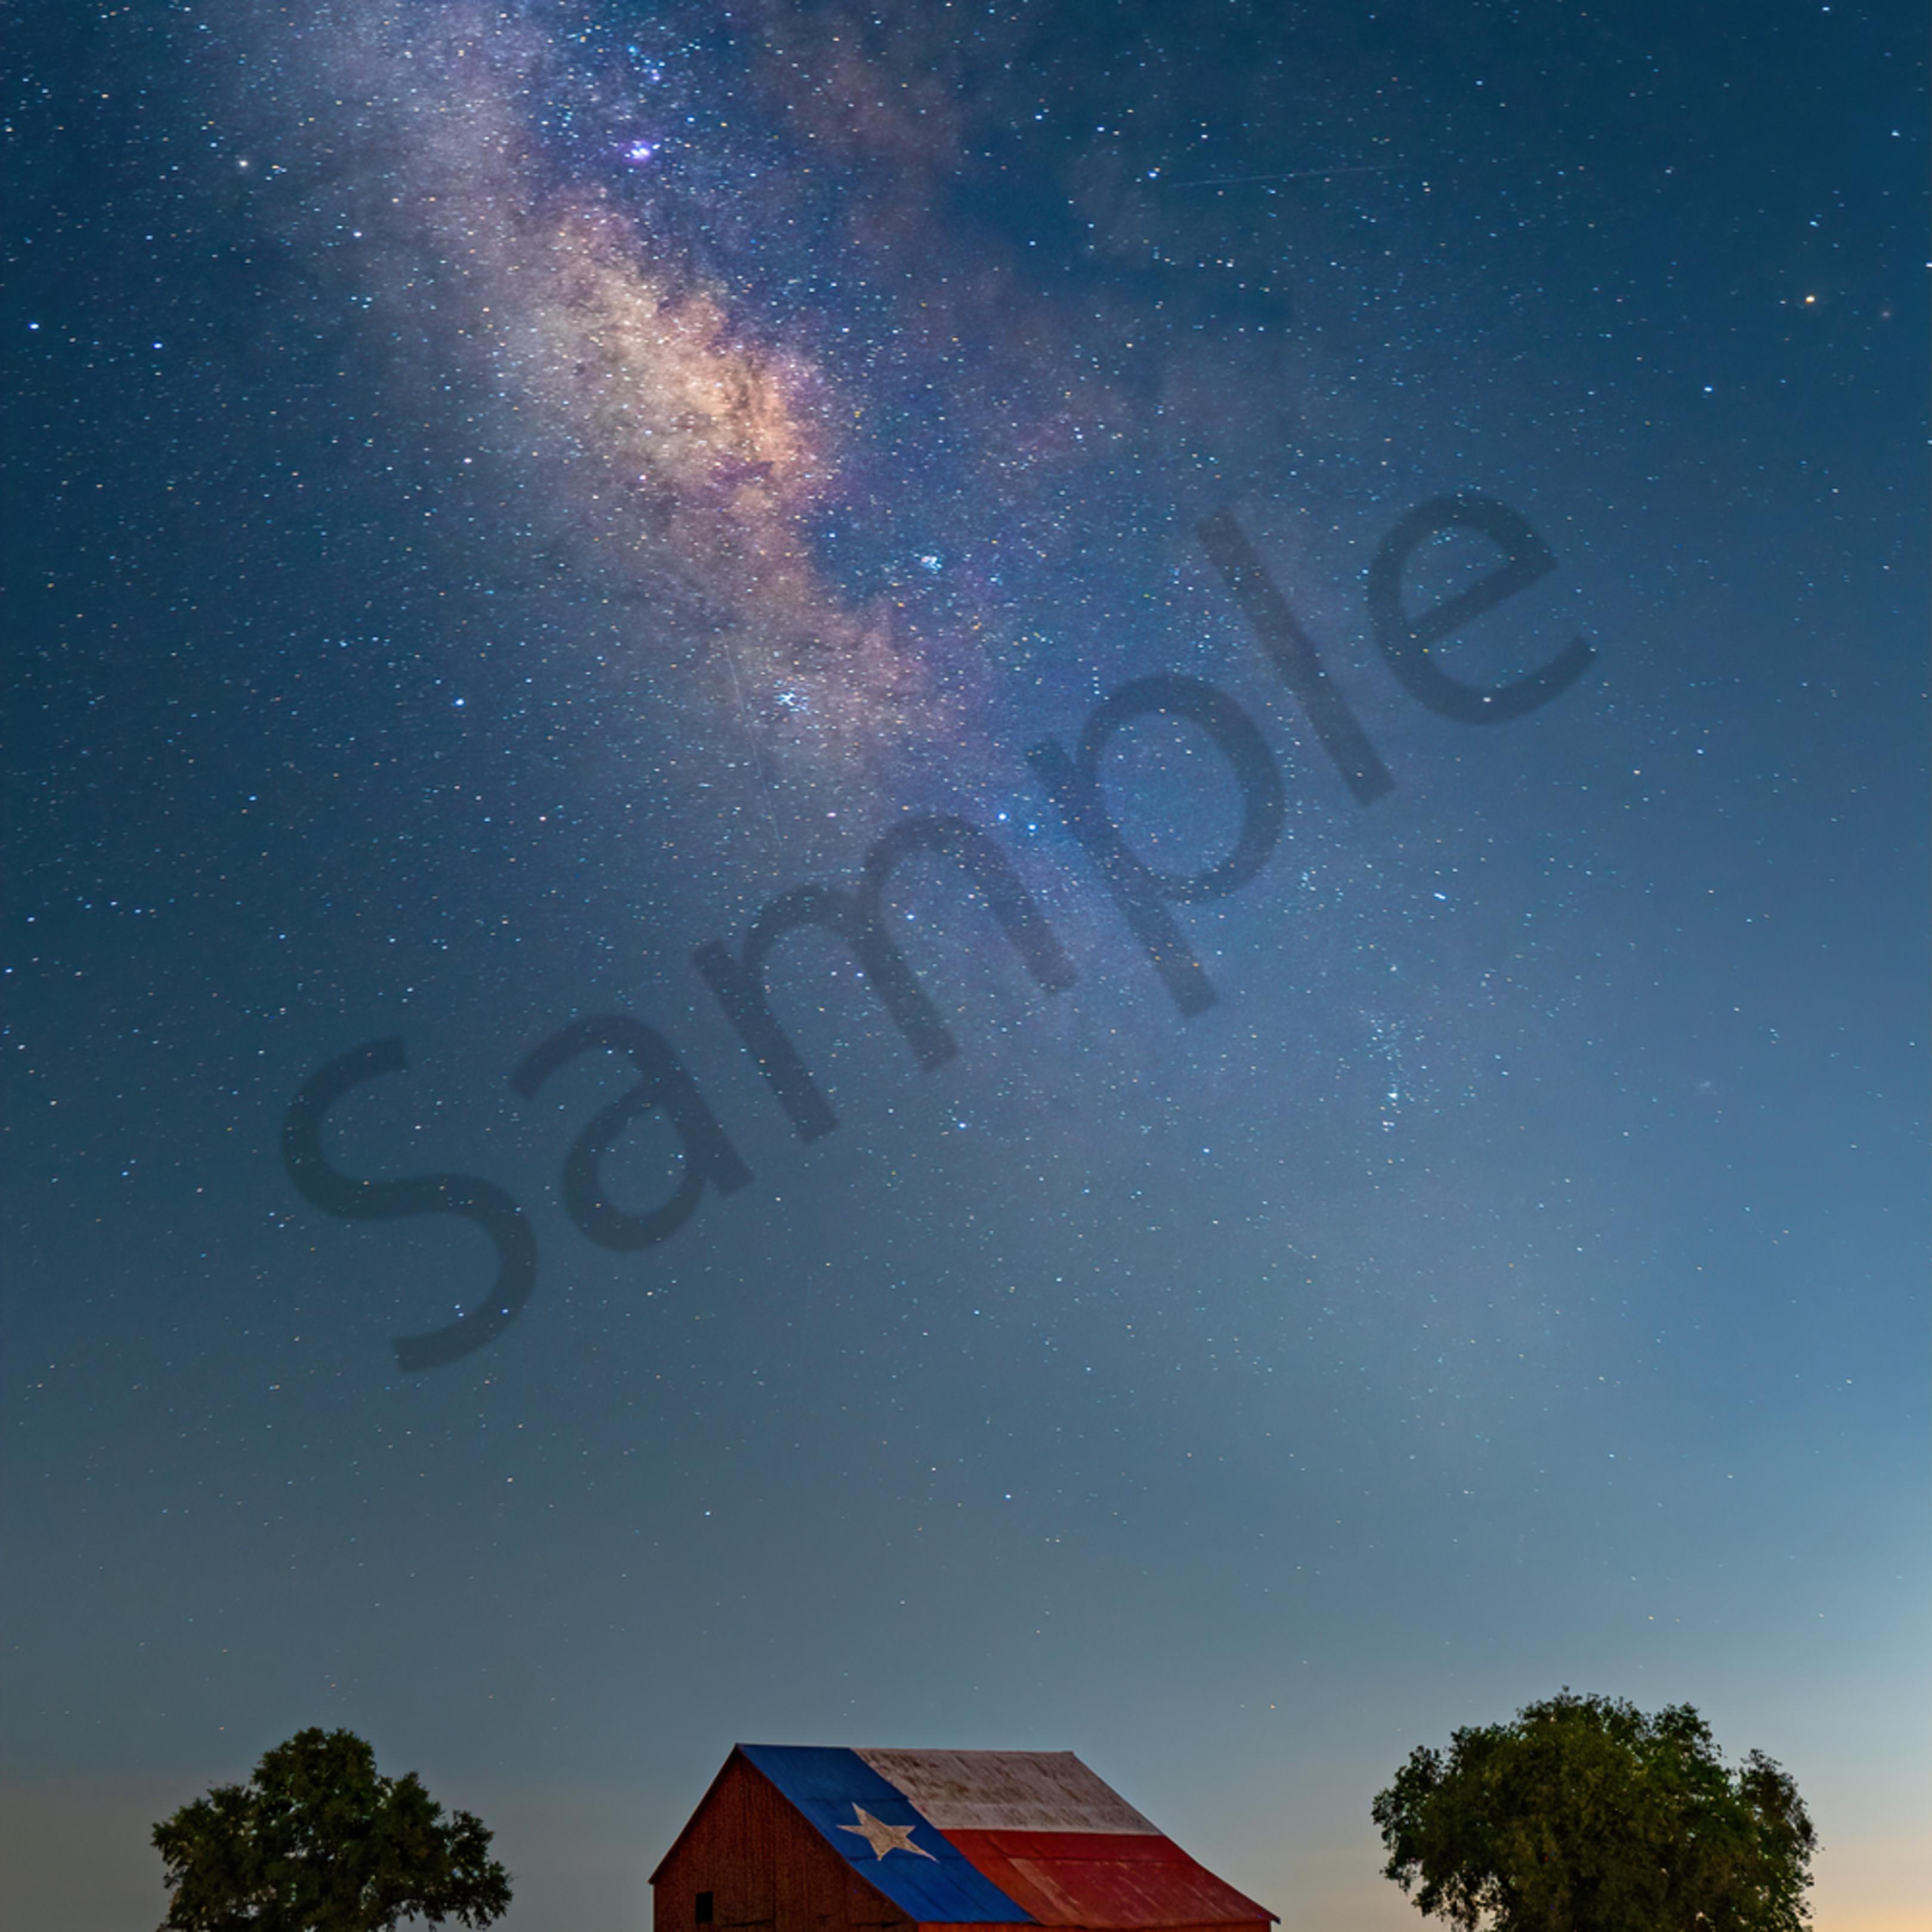 Big sky over texas s6kmbi